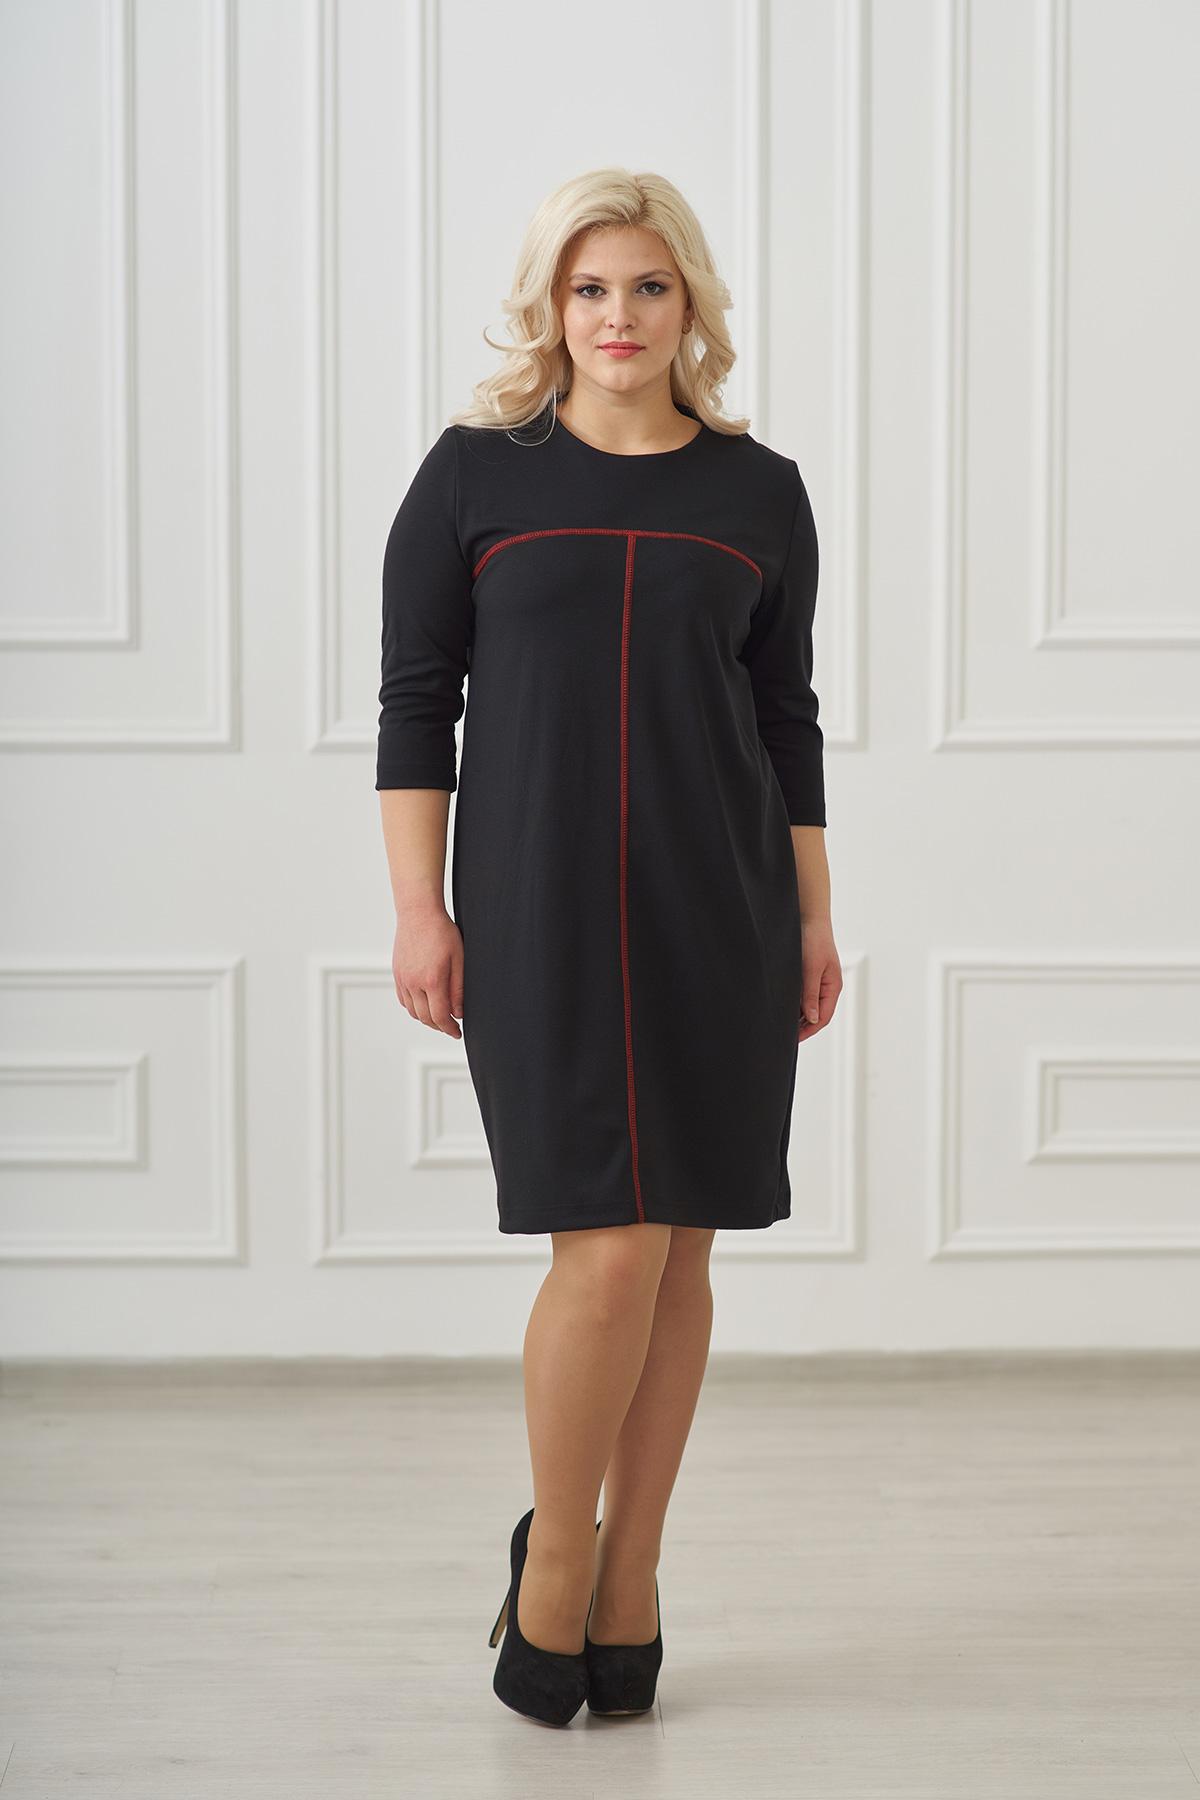 Жен. платье арт. 19-0025 Черный р. 46Платья<br>Факт. ОГ: 92 см <br>Факт. ОТ: 94 см <br>Факт. ОБ: 98 см <br>Длина по спинке: 92 см<br><br>Тип: Жен. платье<br>Размер: 46<br>Материал: Милано